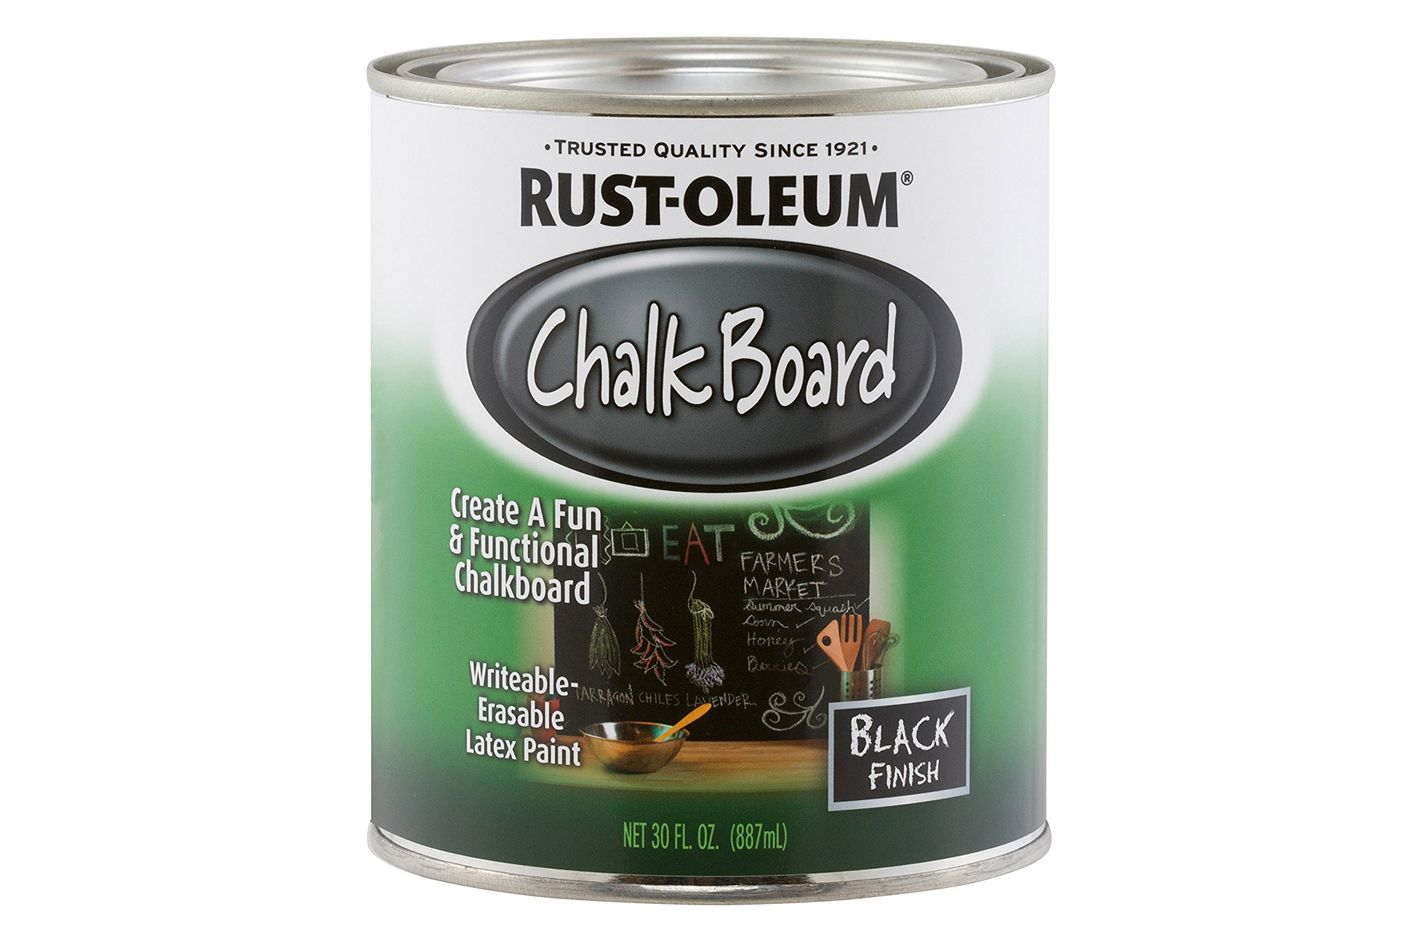 Chalkboard Brush-On